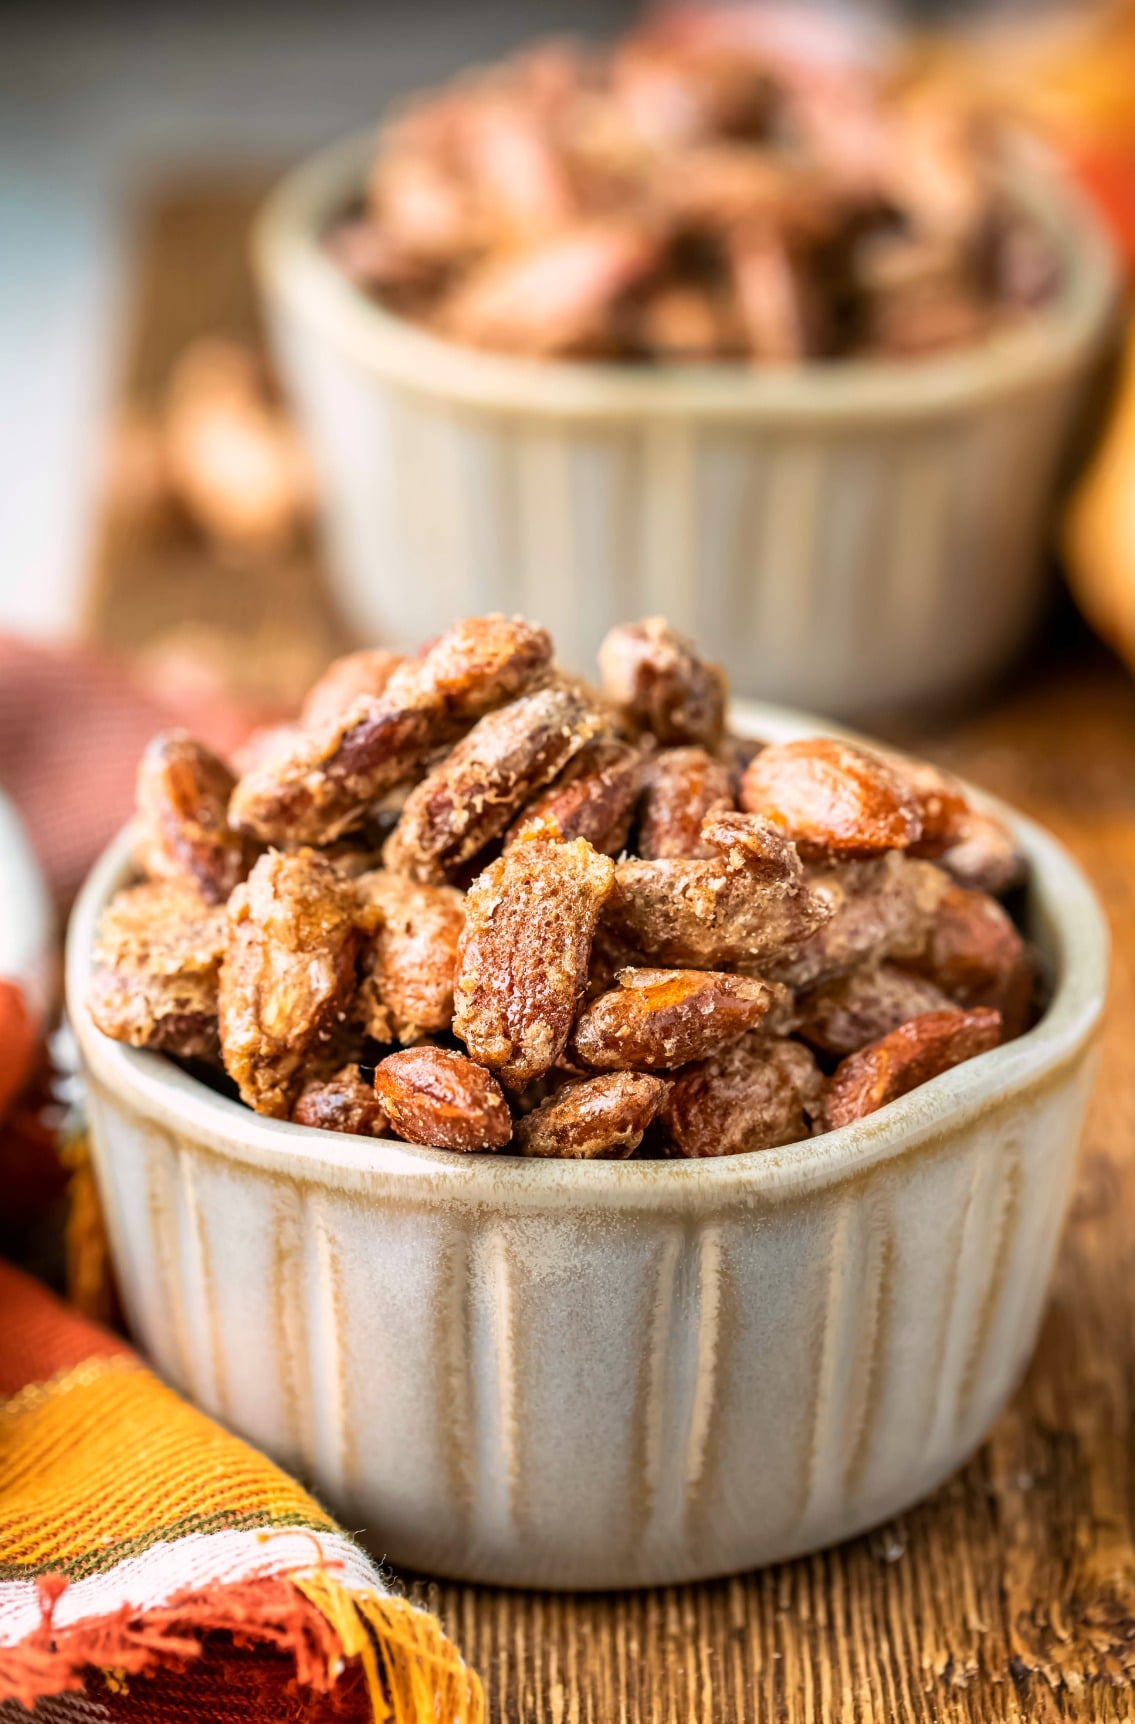 Two ramekins of cinnamon almonds on a wooden cutting board